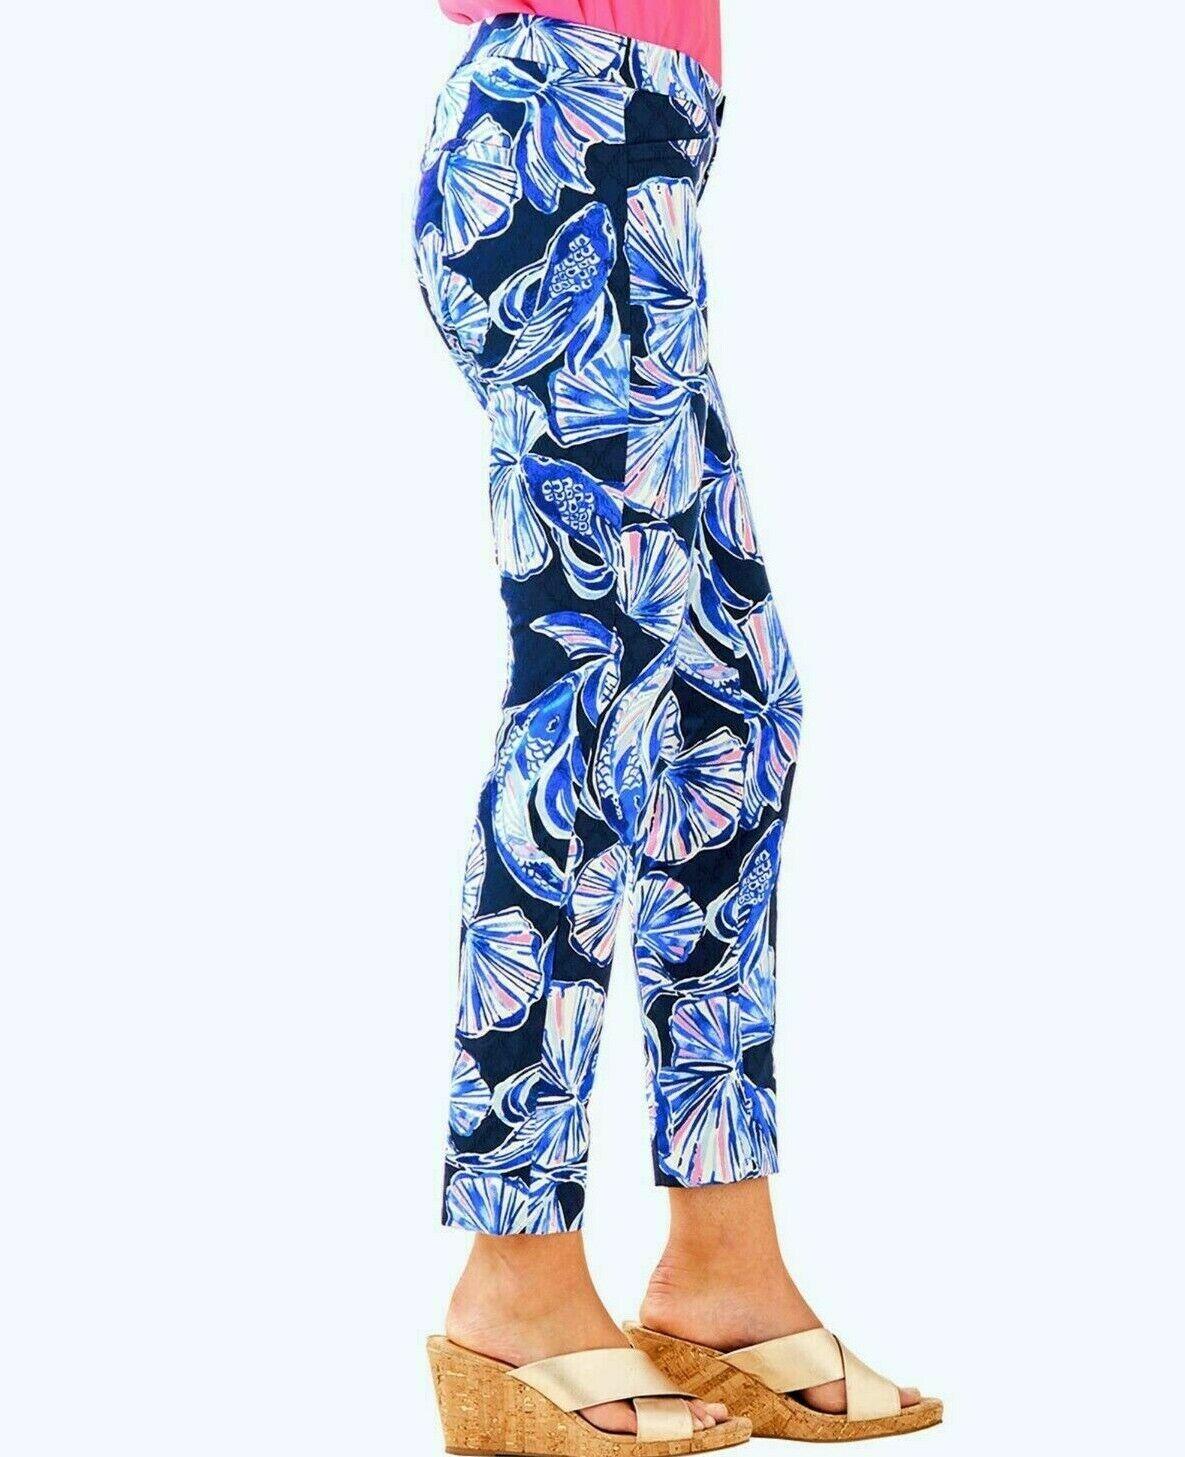 Neuf avec étiquette Lilly Pulitzer sz4 Kelly Skinny Cheville Pantalon stretch clair Marine rôle Lif